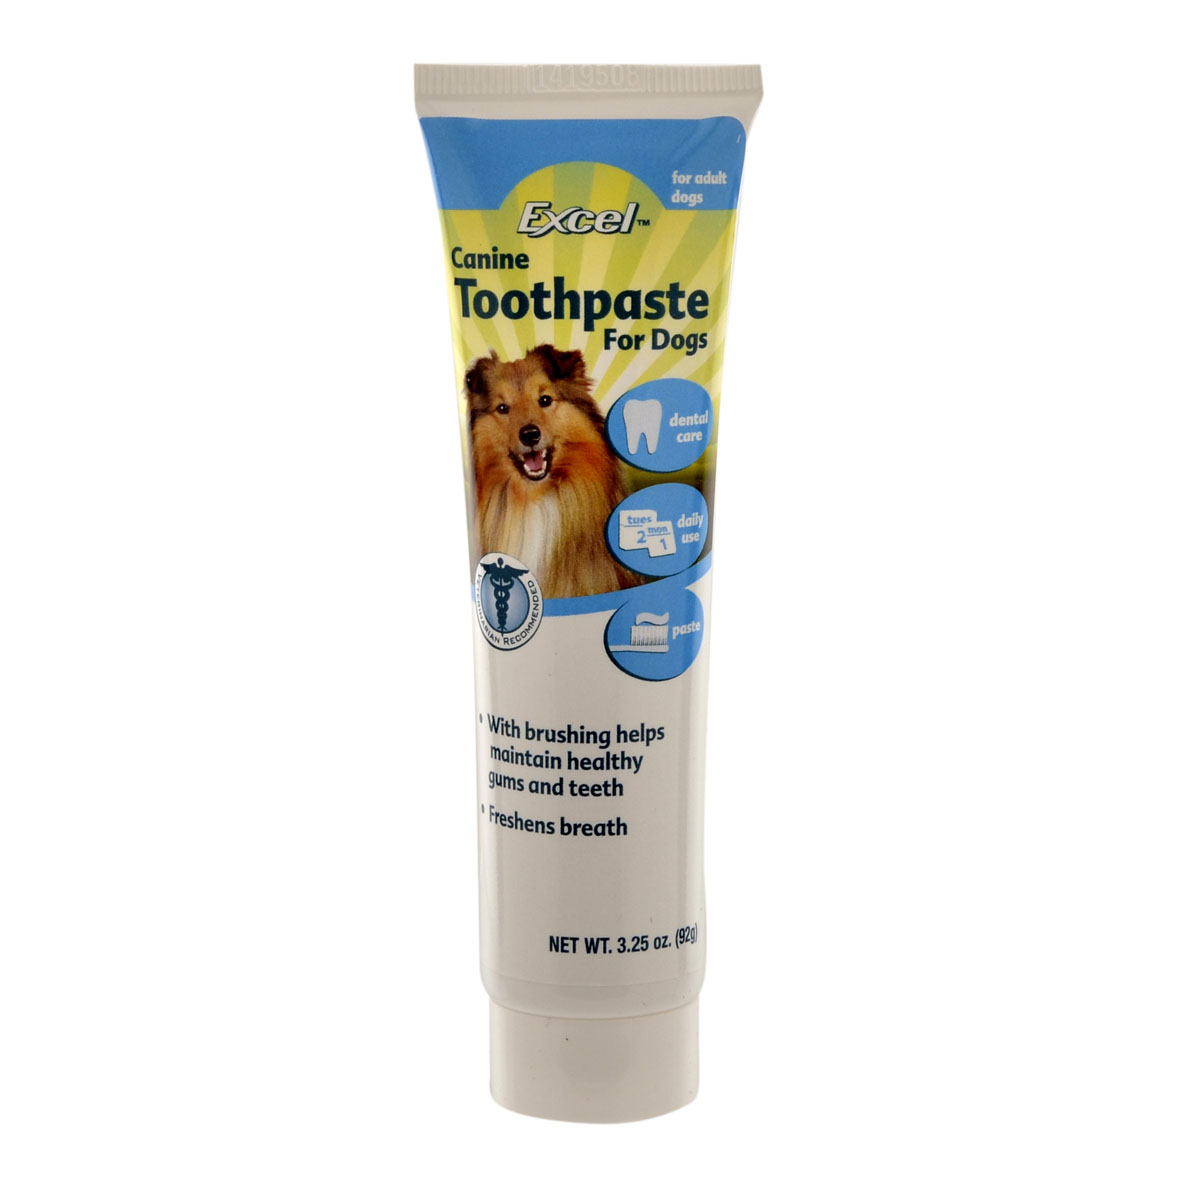 Зубная паста для собак 8 in1  Excel Canine Toothpaste , свежее дыхание, 92 г